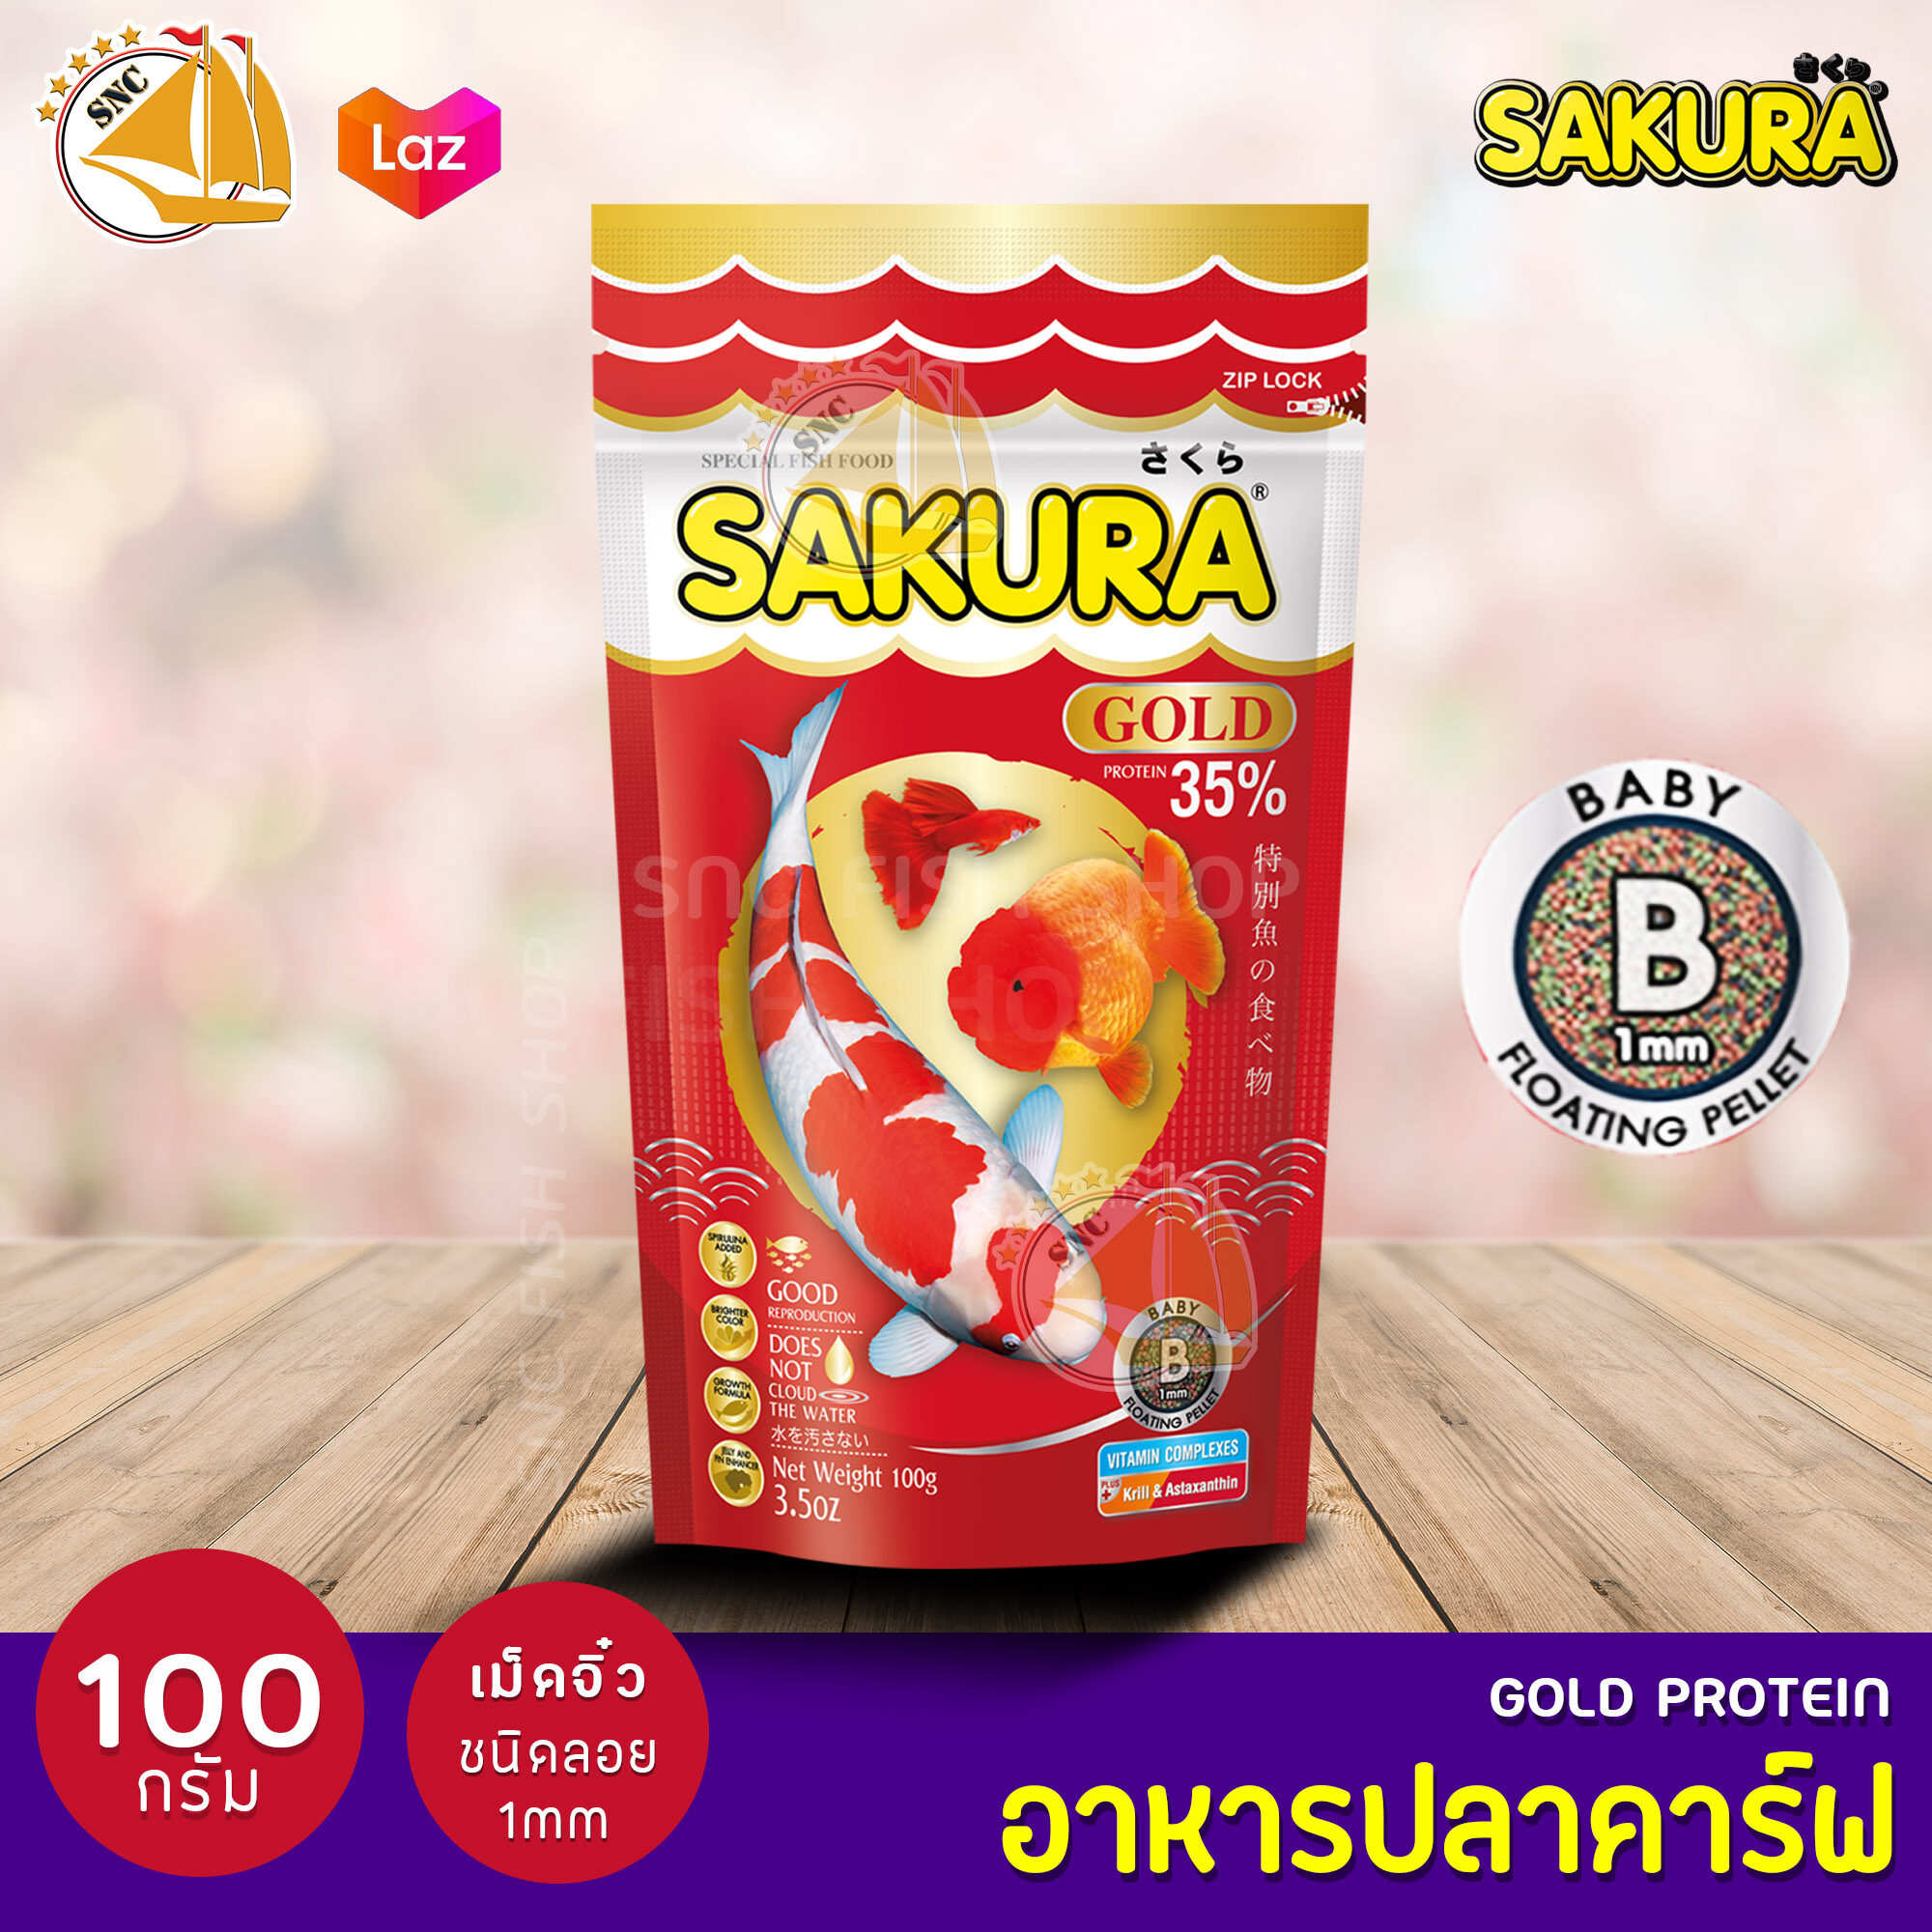 SAKURA Gold 100 กรัม เม็ดขนาด B (ถุงแดง-เหลือง)